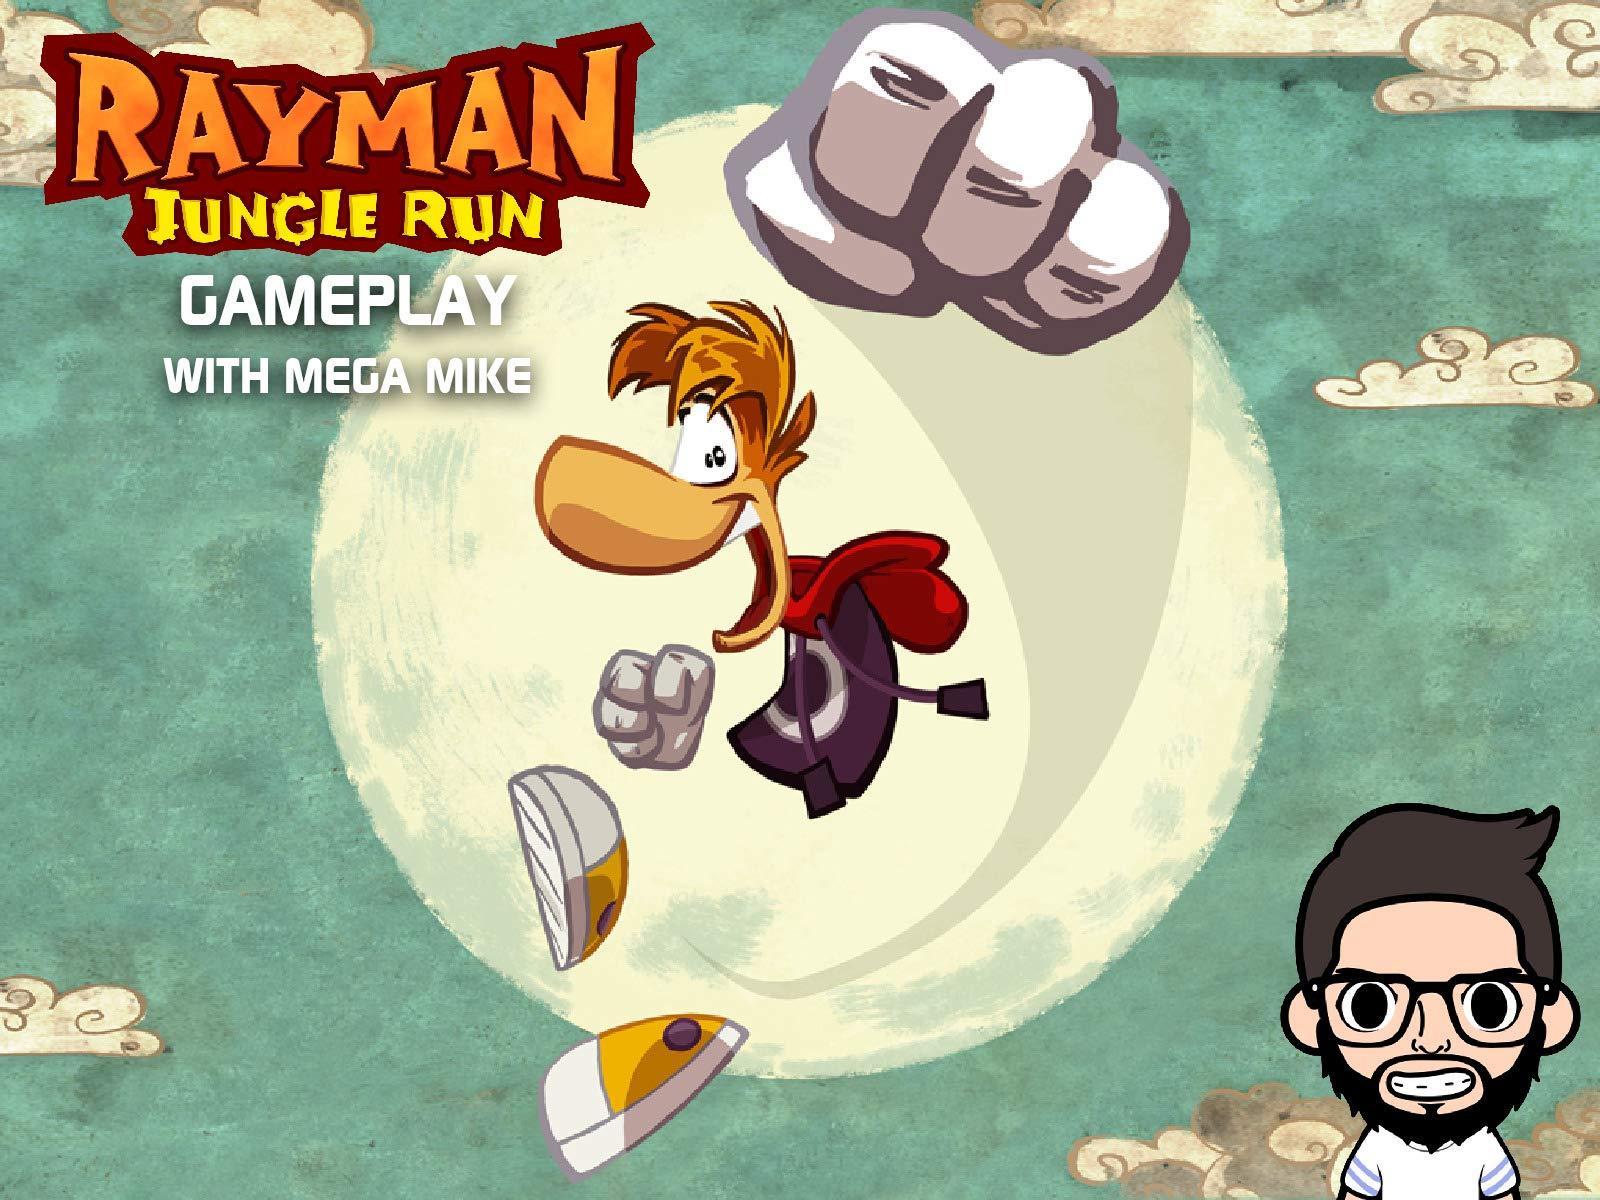 Clip: Rayman Jungle Run Gameplay With Mega Mike - Season 1